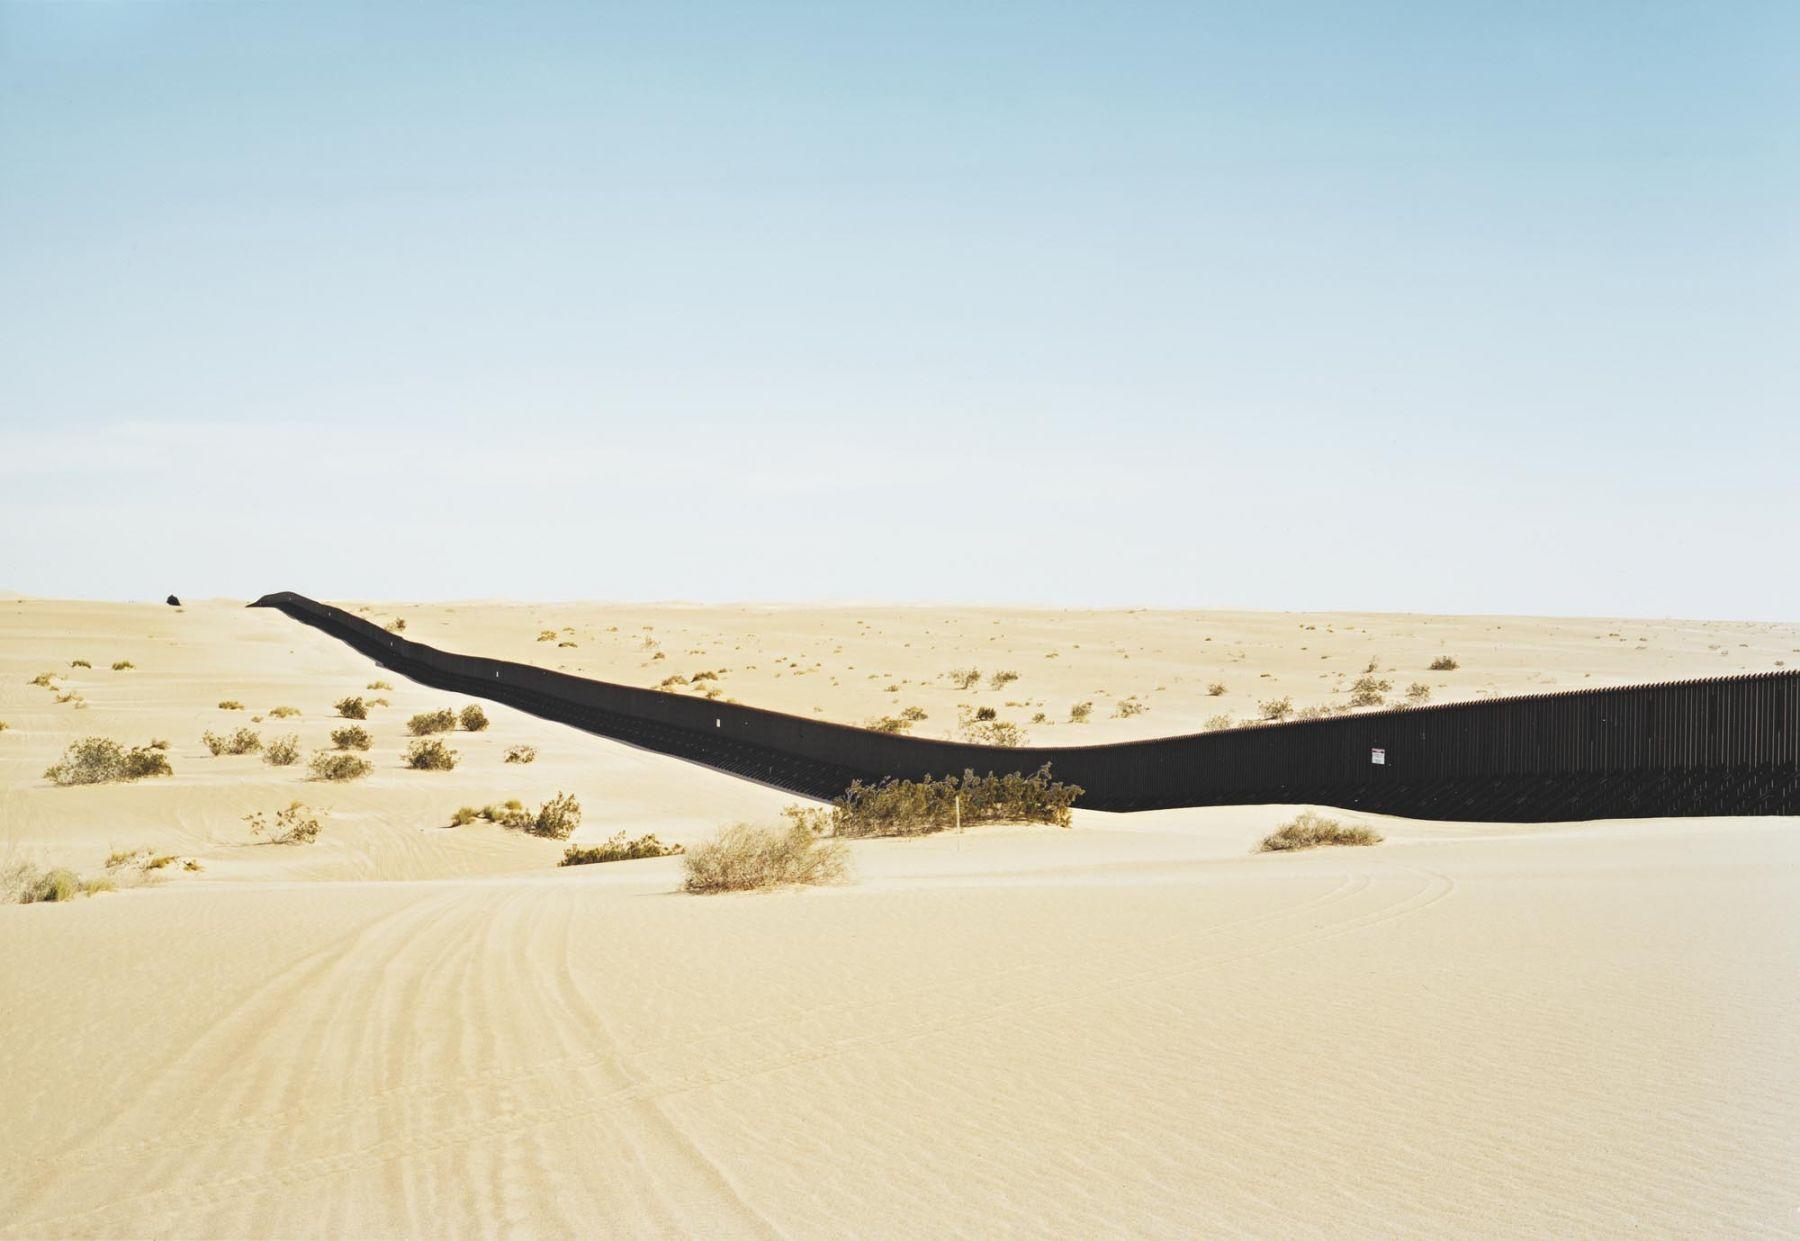 Untitled (Dunes) near El Centro, California, 2010, 39 x 55 or 55 x 75 inch chromogenic print